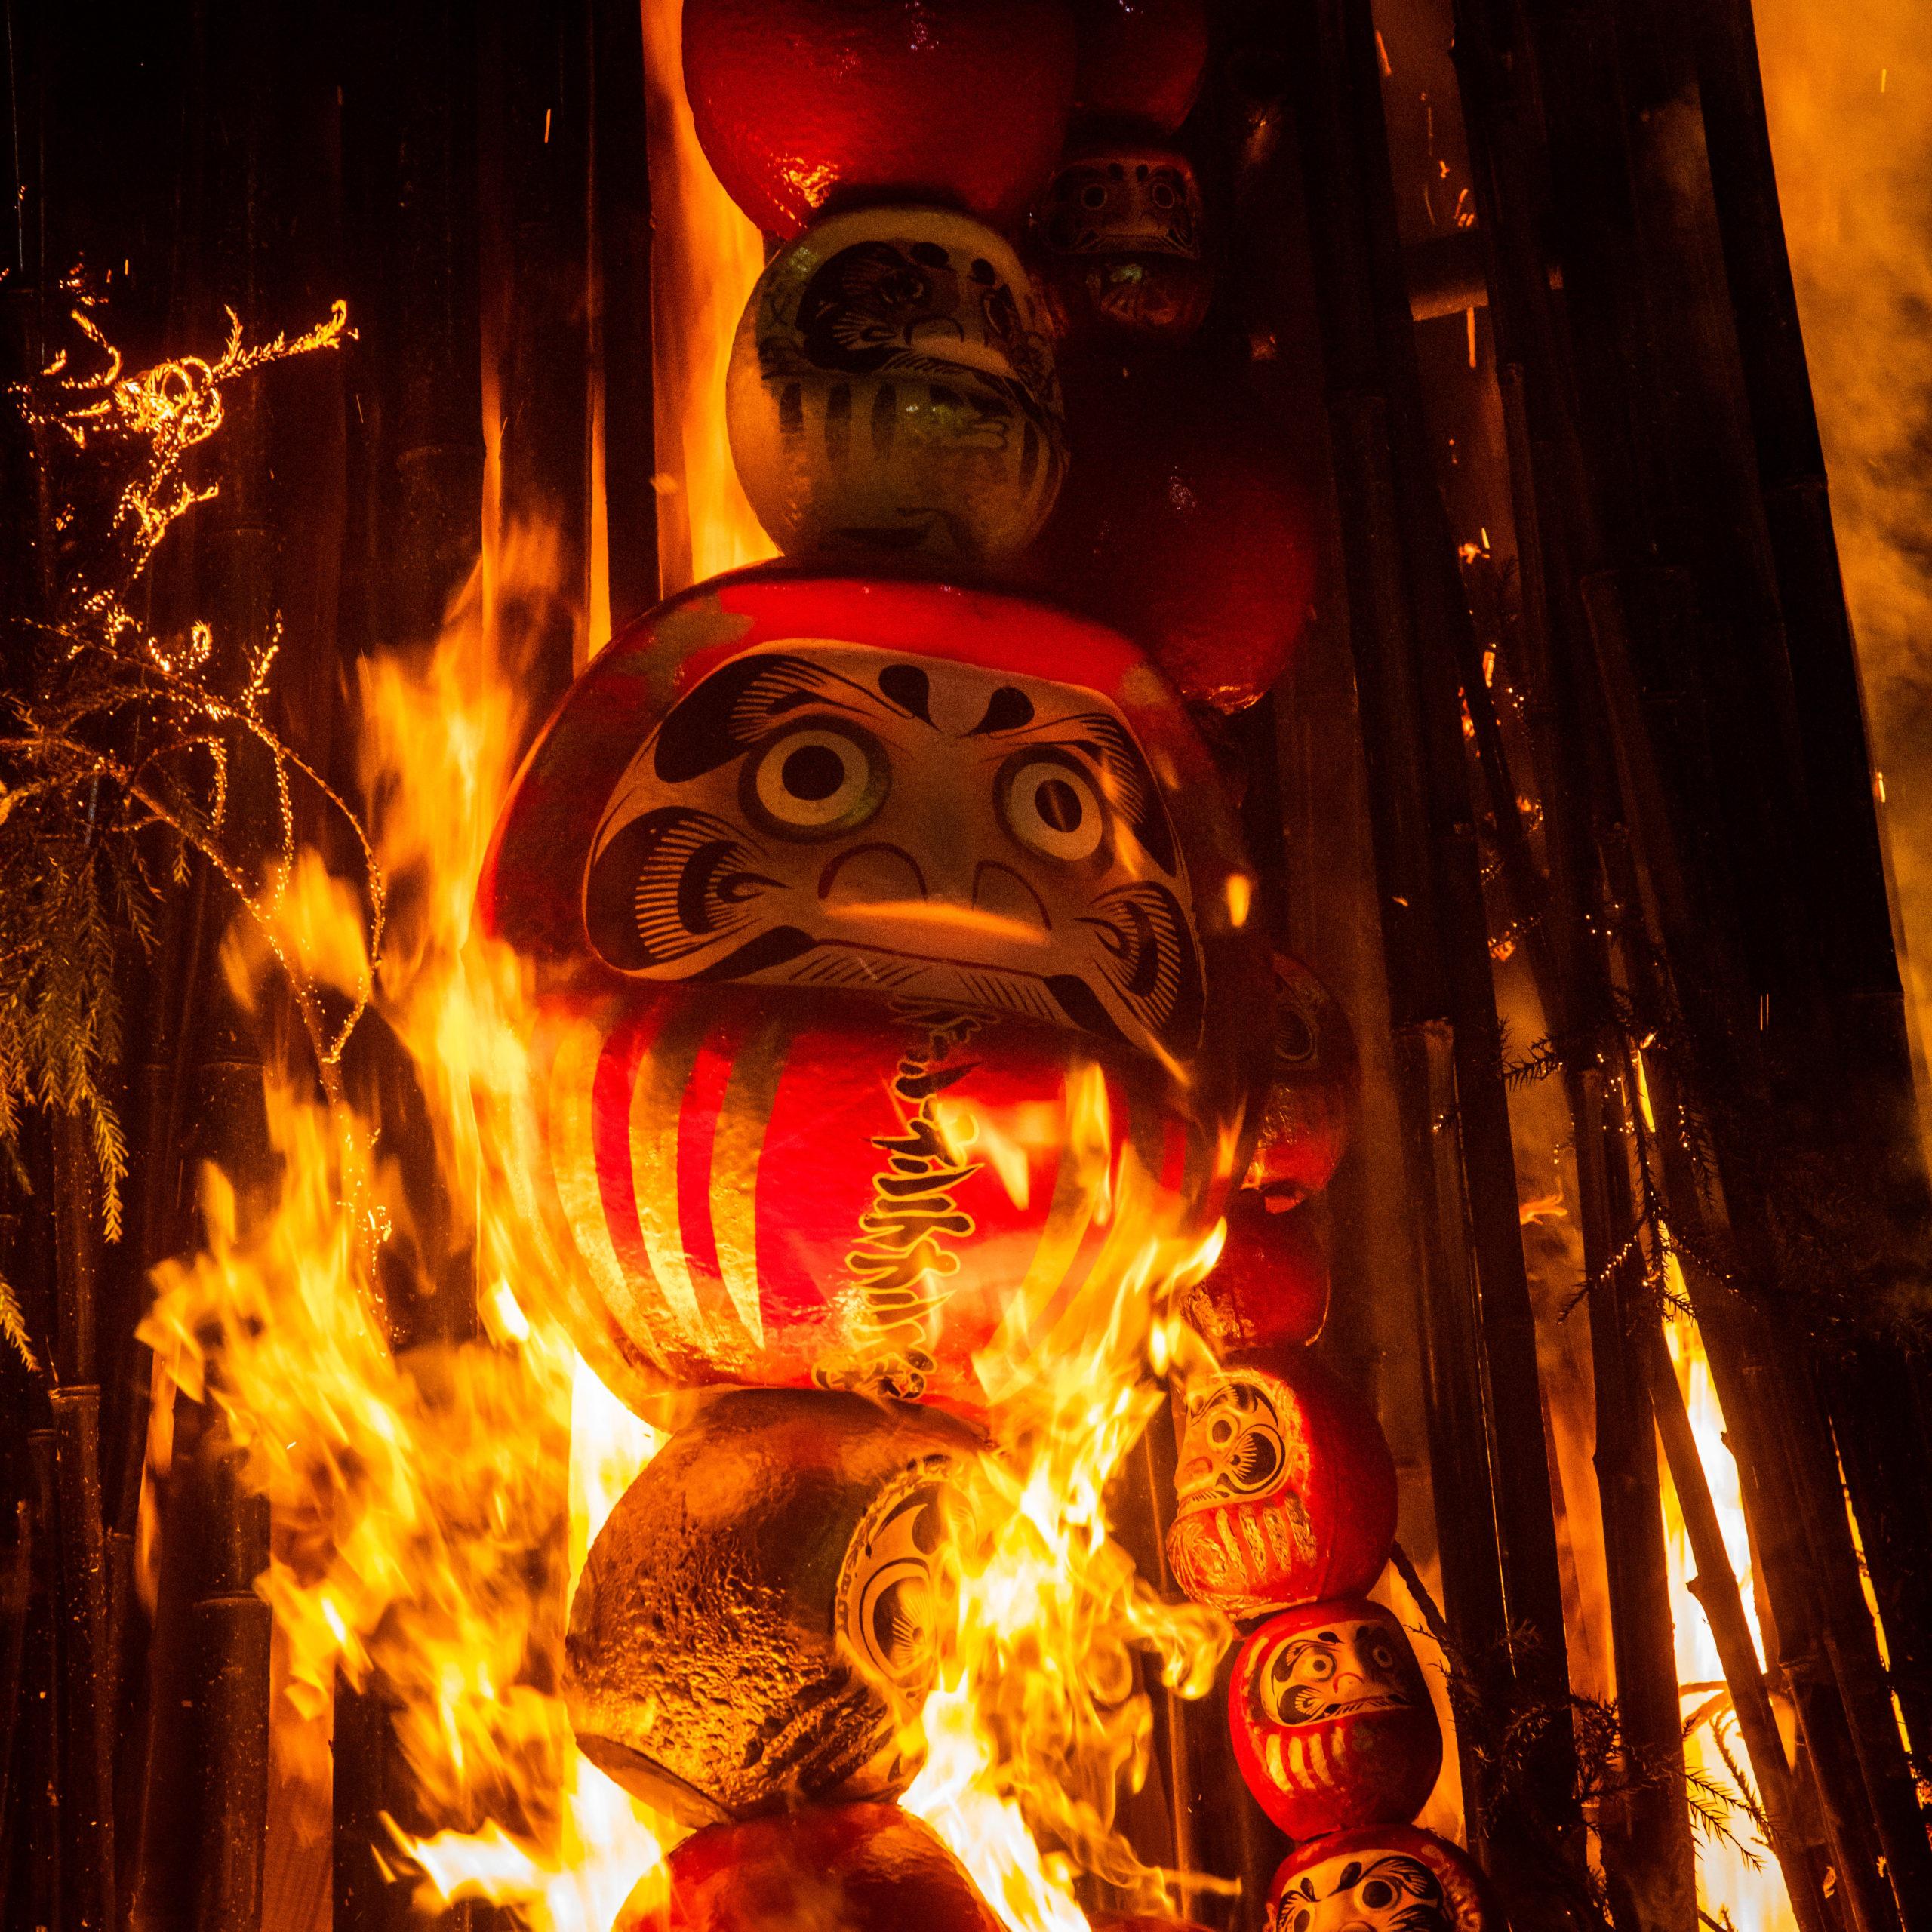 Happo Fire fest bonfire